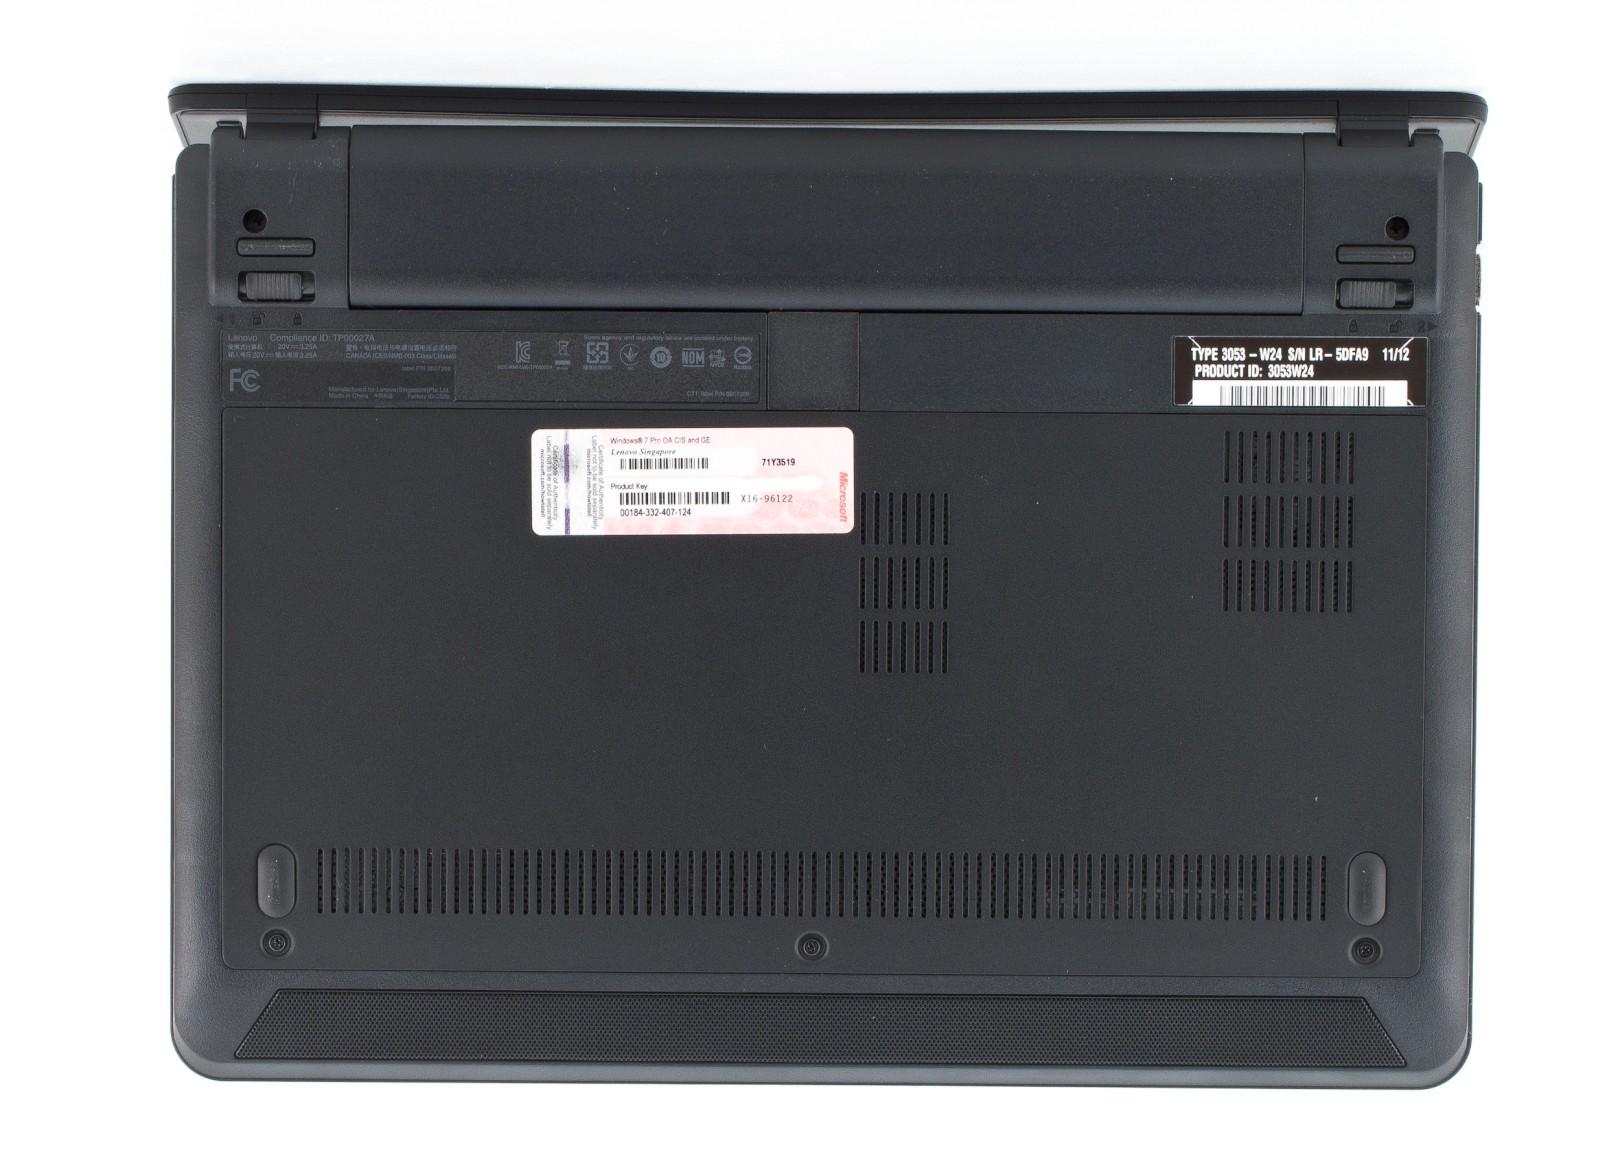 Drivers for Lenovo ThinkPad X121e Ericsson WWAN